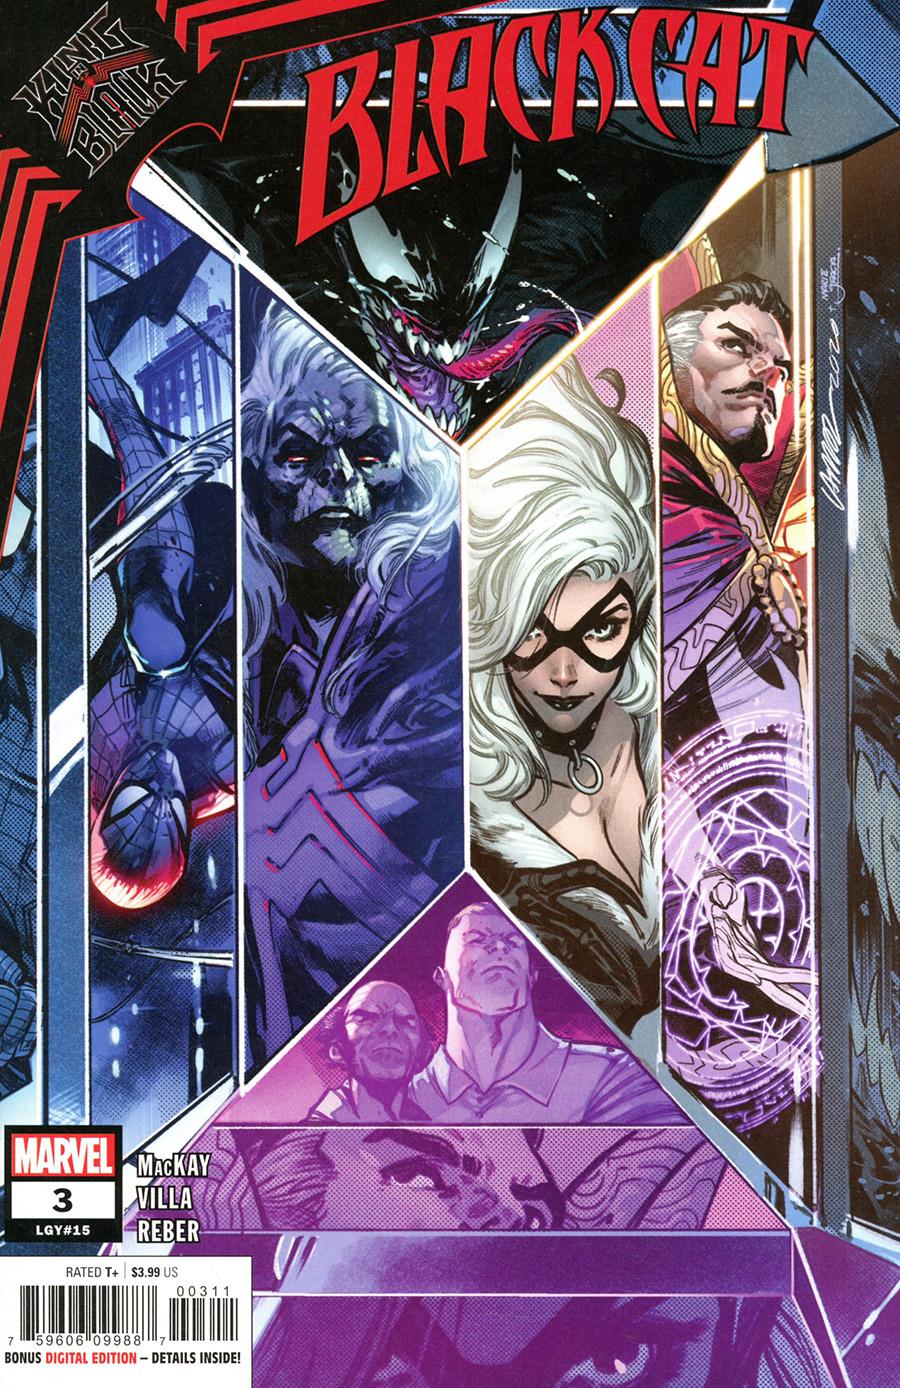 Black Cat Vol 2 #3 Cover A Regular Pepe Larraz Cover (King In Black Tie-In)